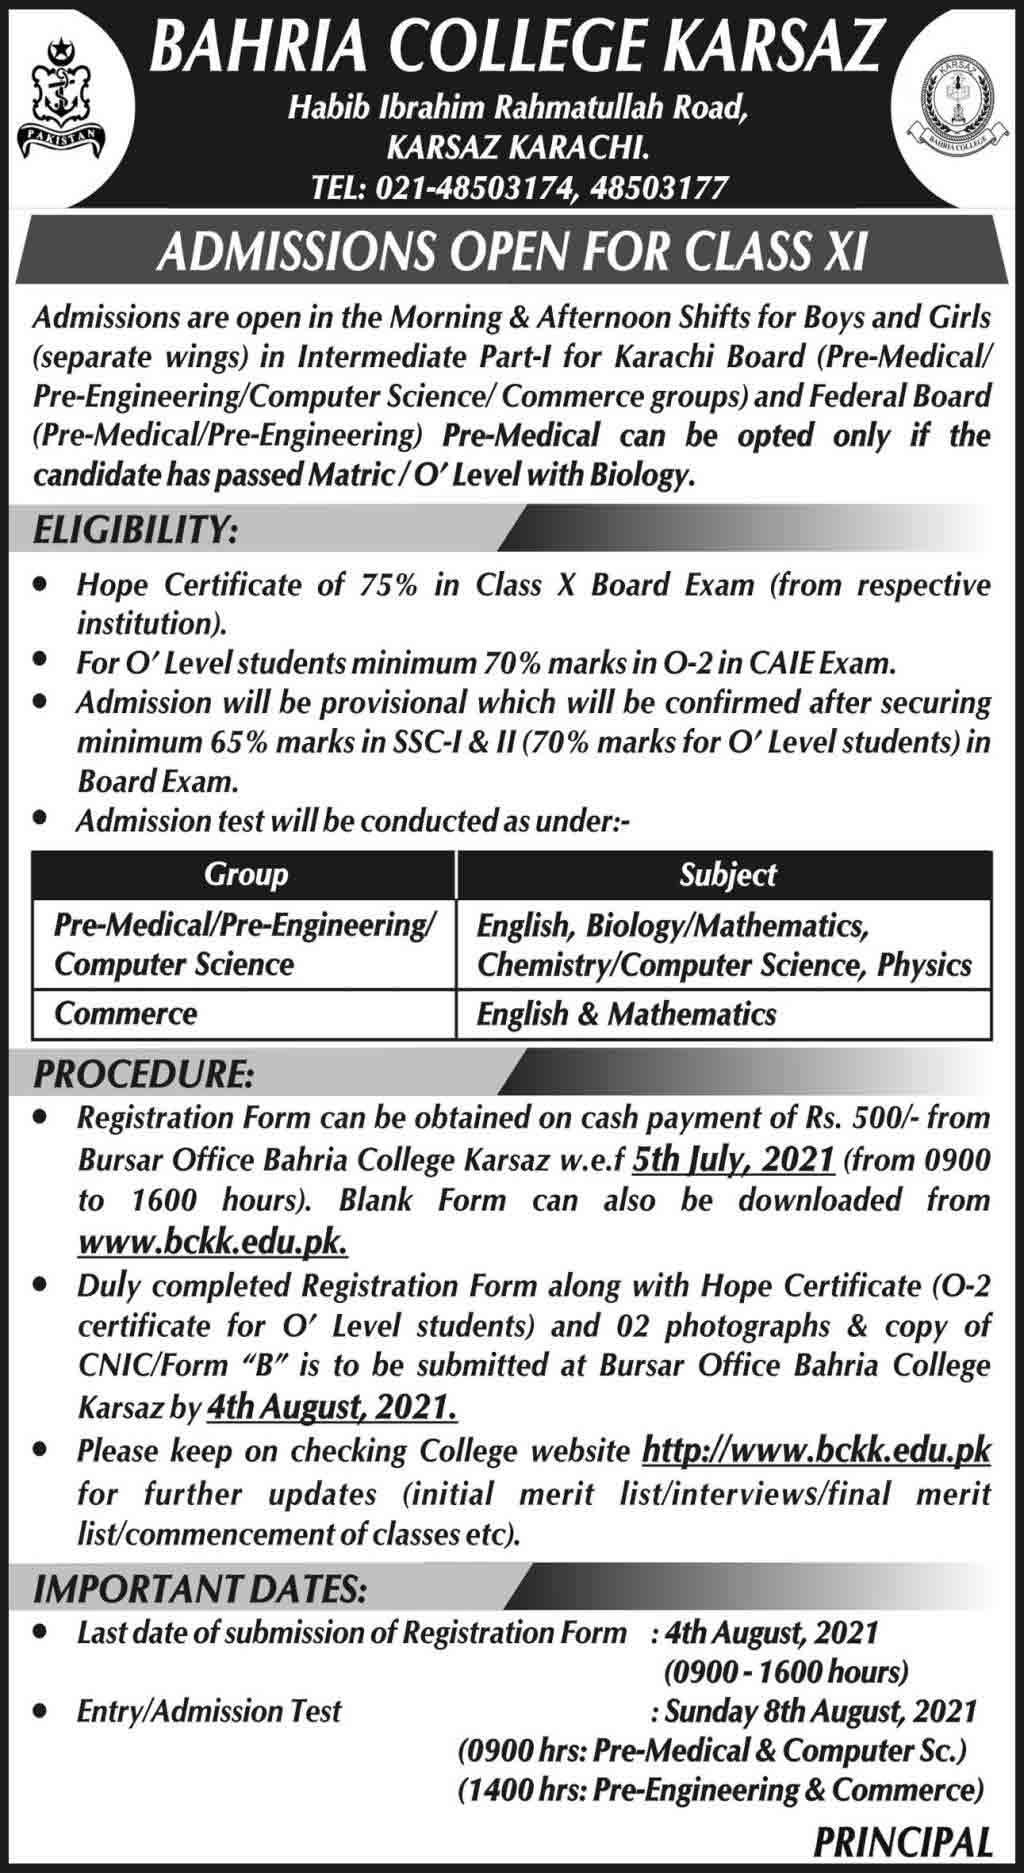 Bahria-College-Karsaz-Karachi-Admission-2021